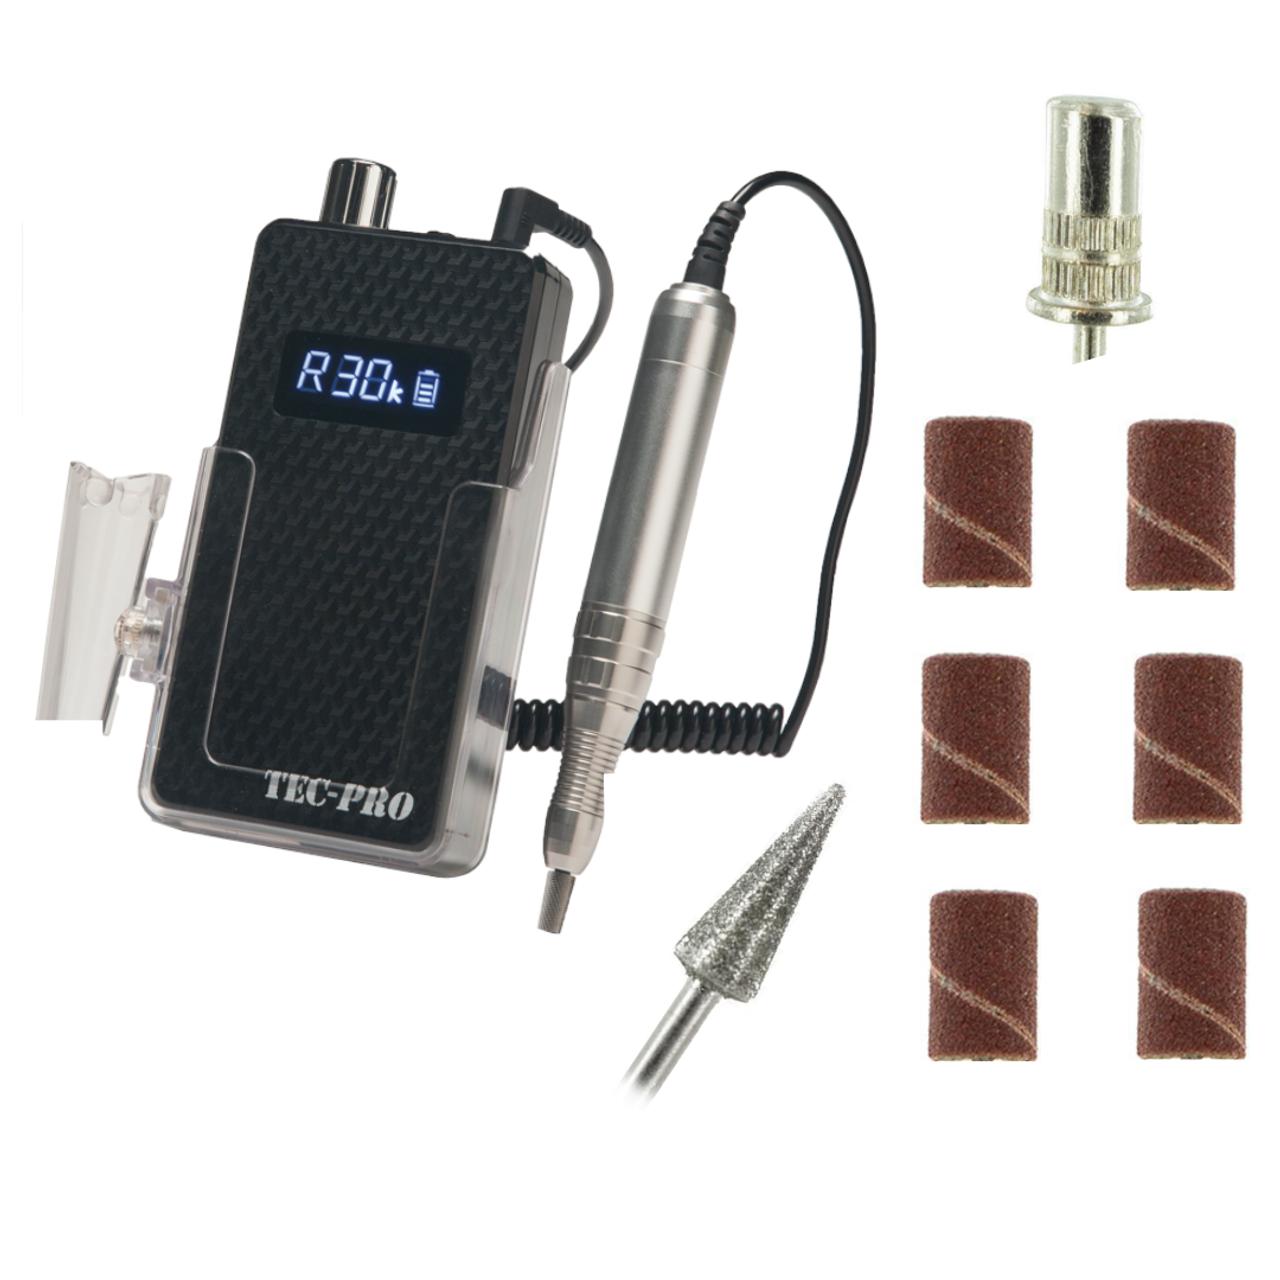 Tec Pro Portable Nail Drill, Black